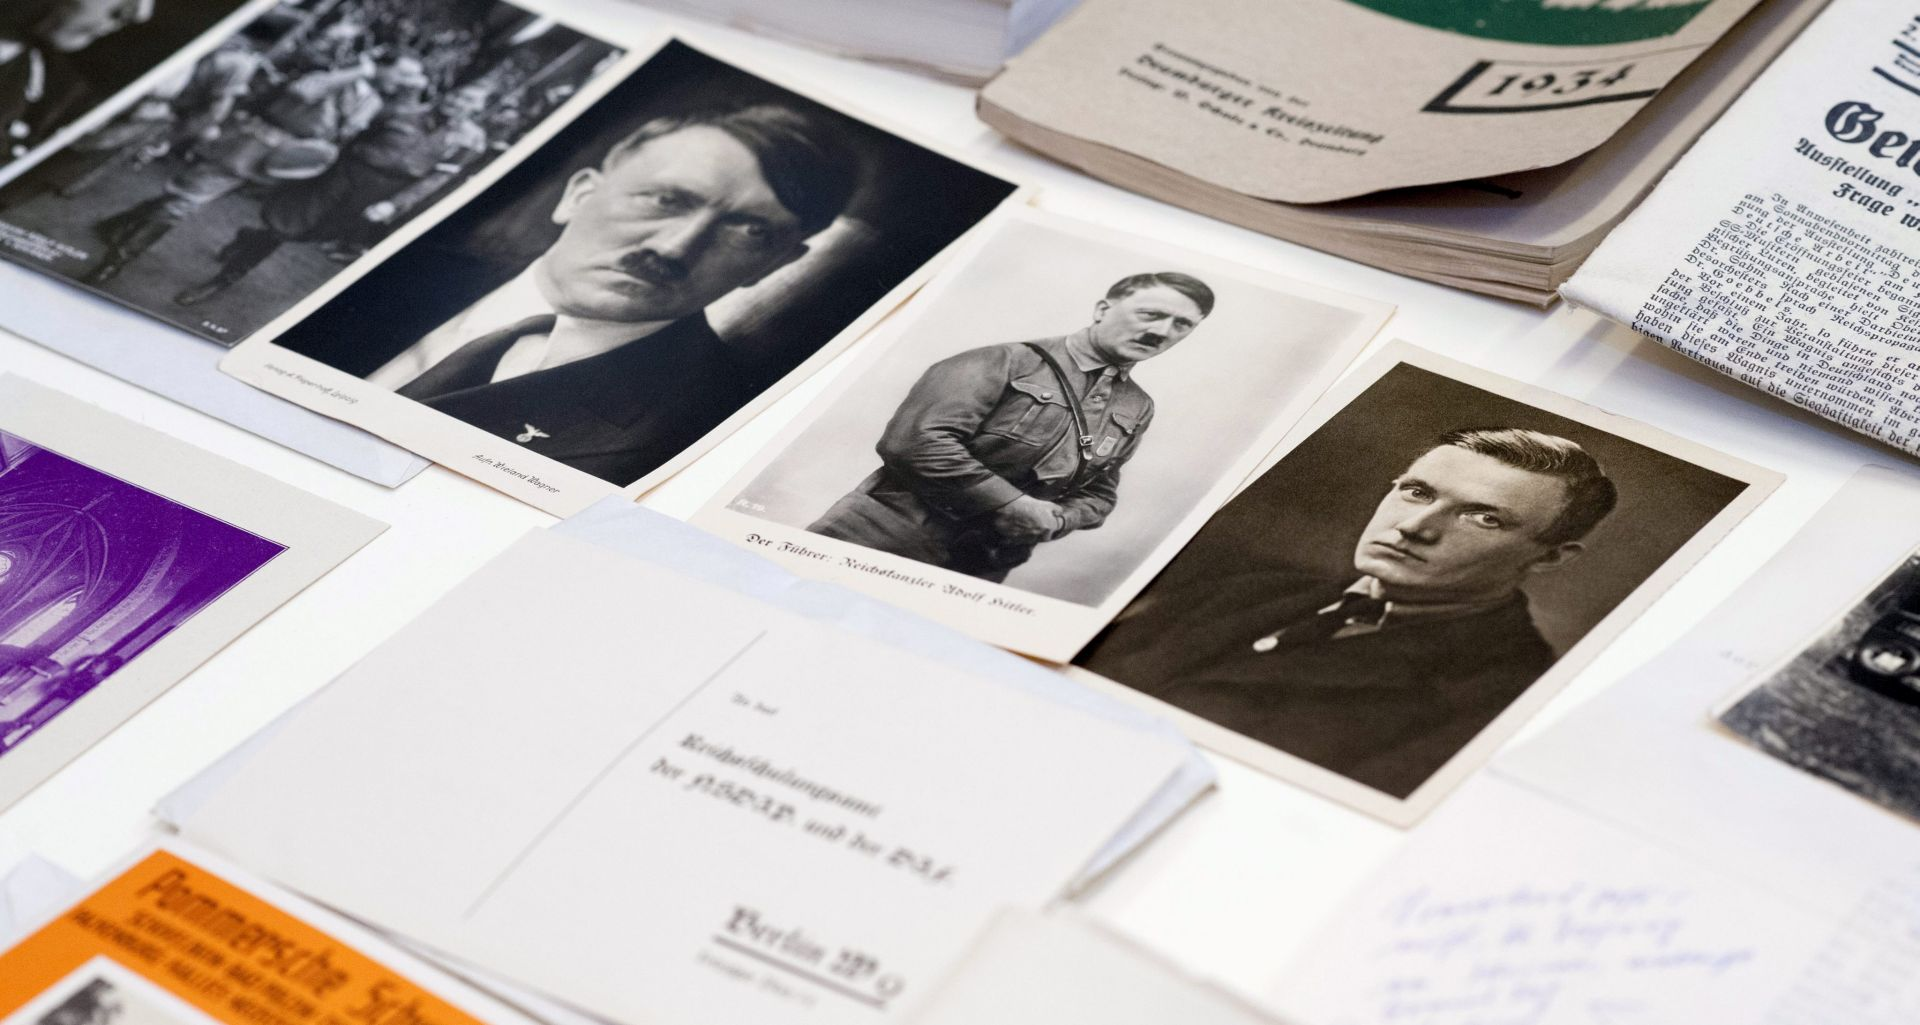 ZNANSTVENICI Hitler je definitivno umro 1945.